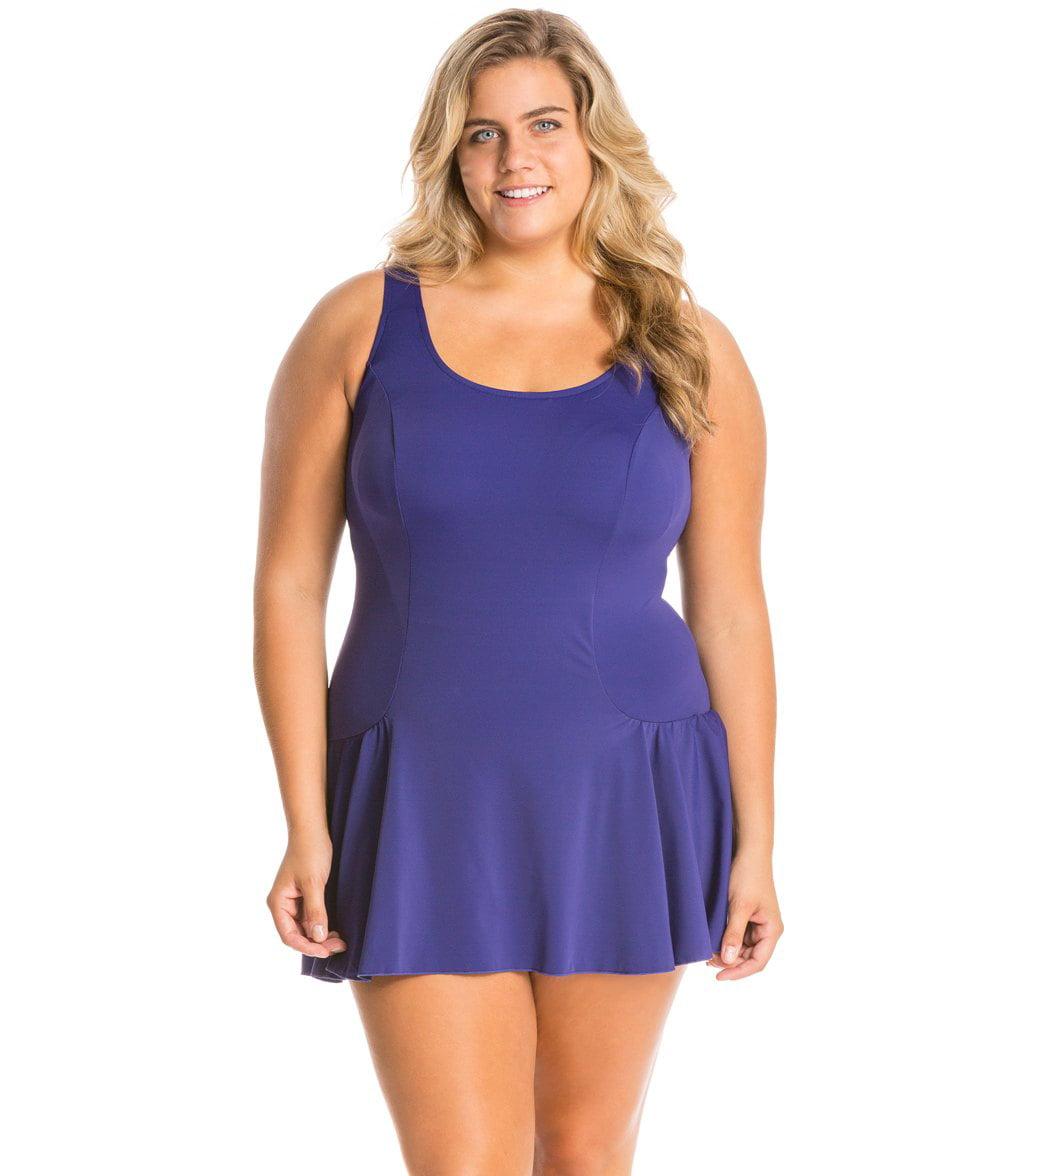 Beach Belle Spruce Mesh Swimdress | Swim dress, Plus size